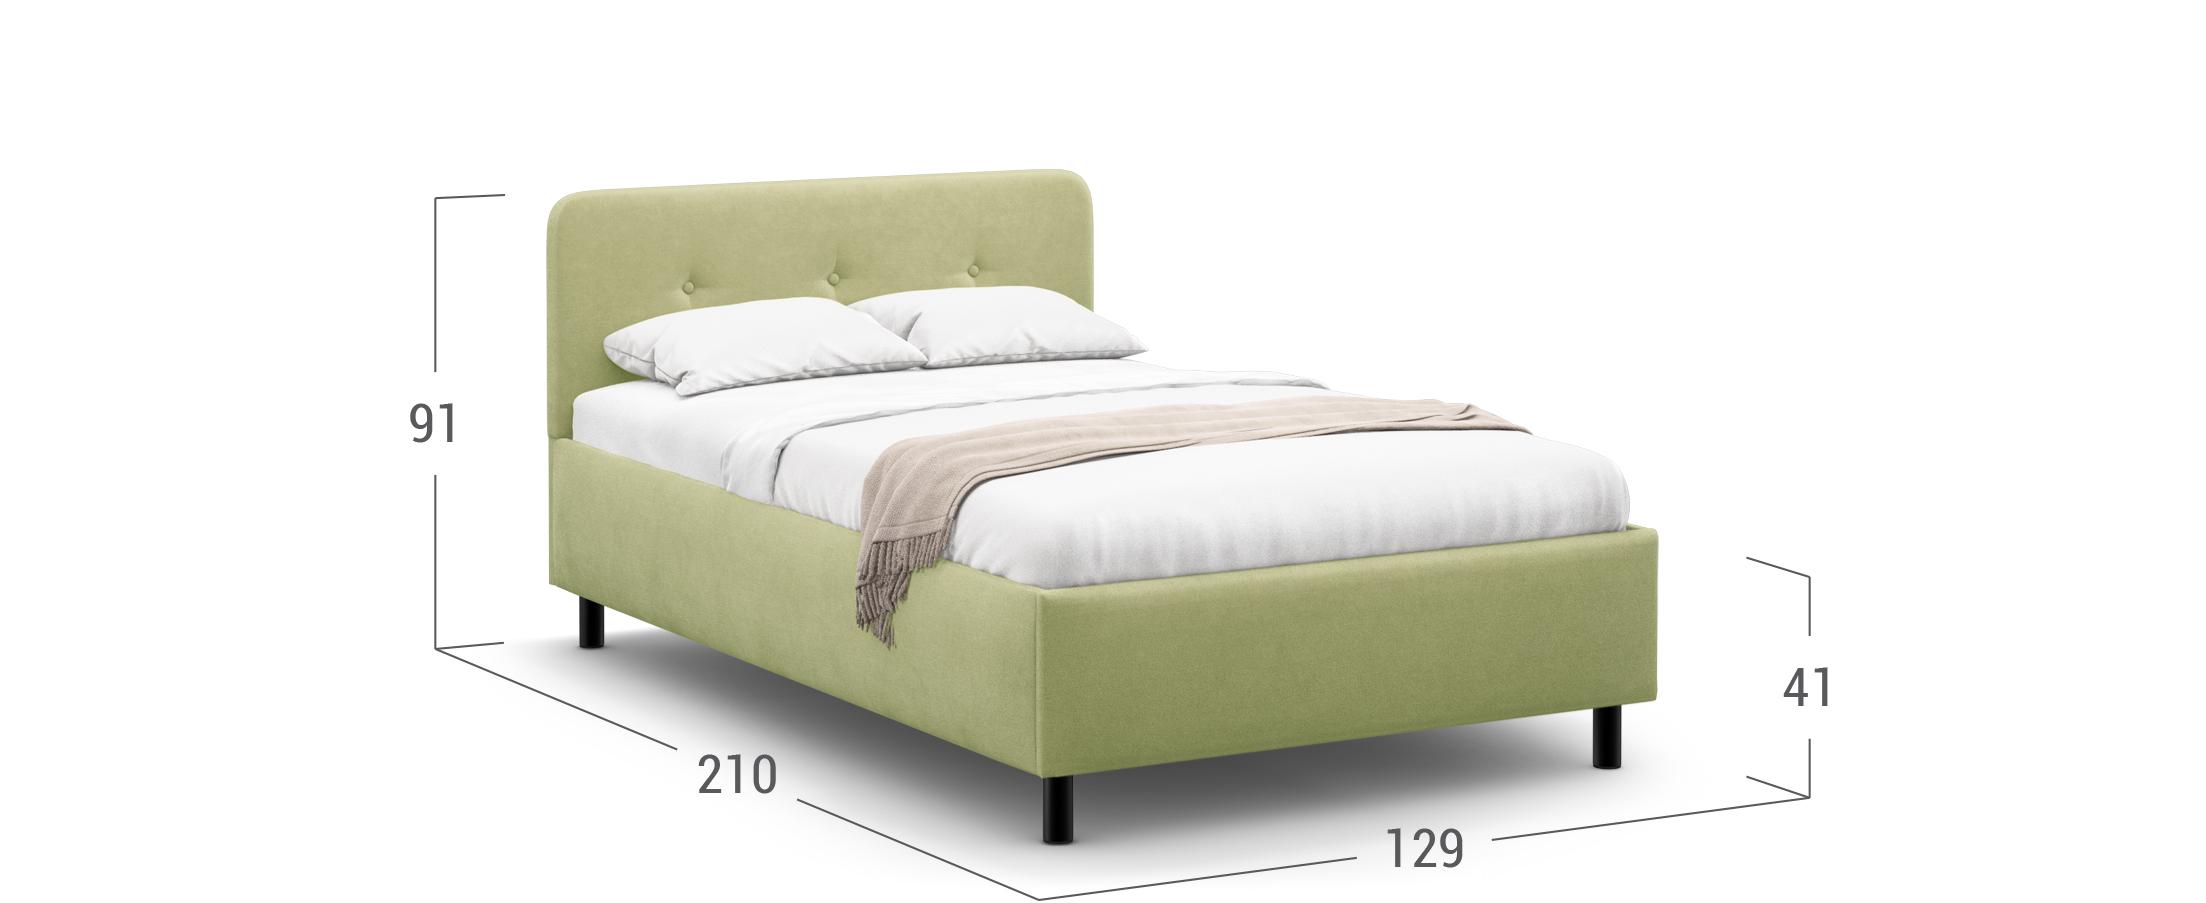 Кровать односпальная MOON FAMILY 1232 120х200